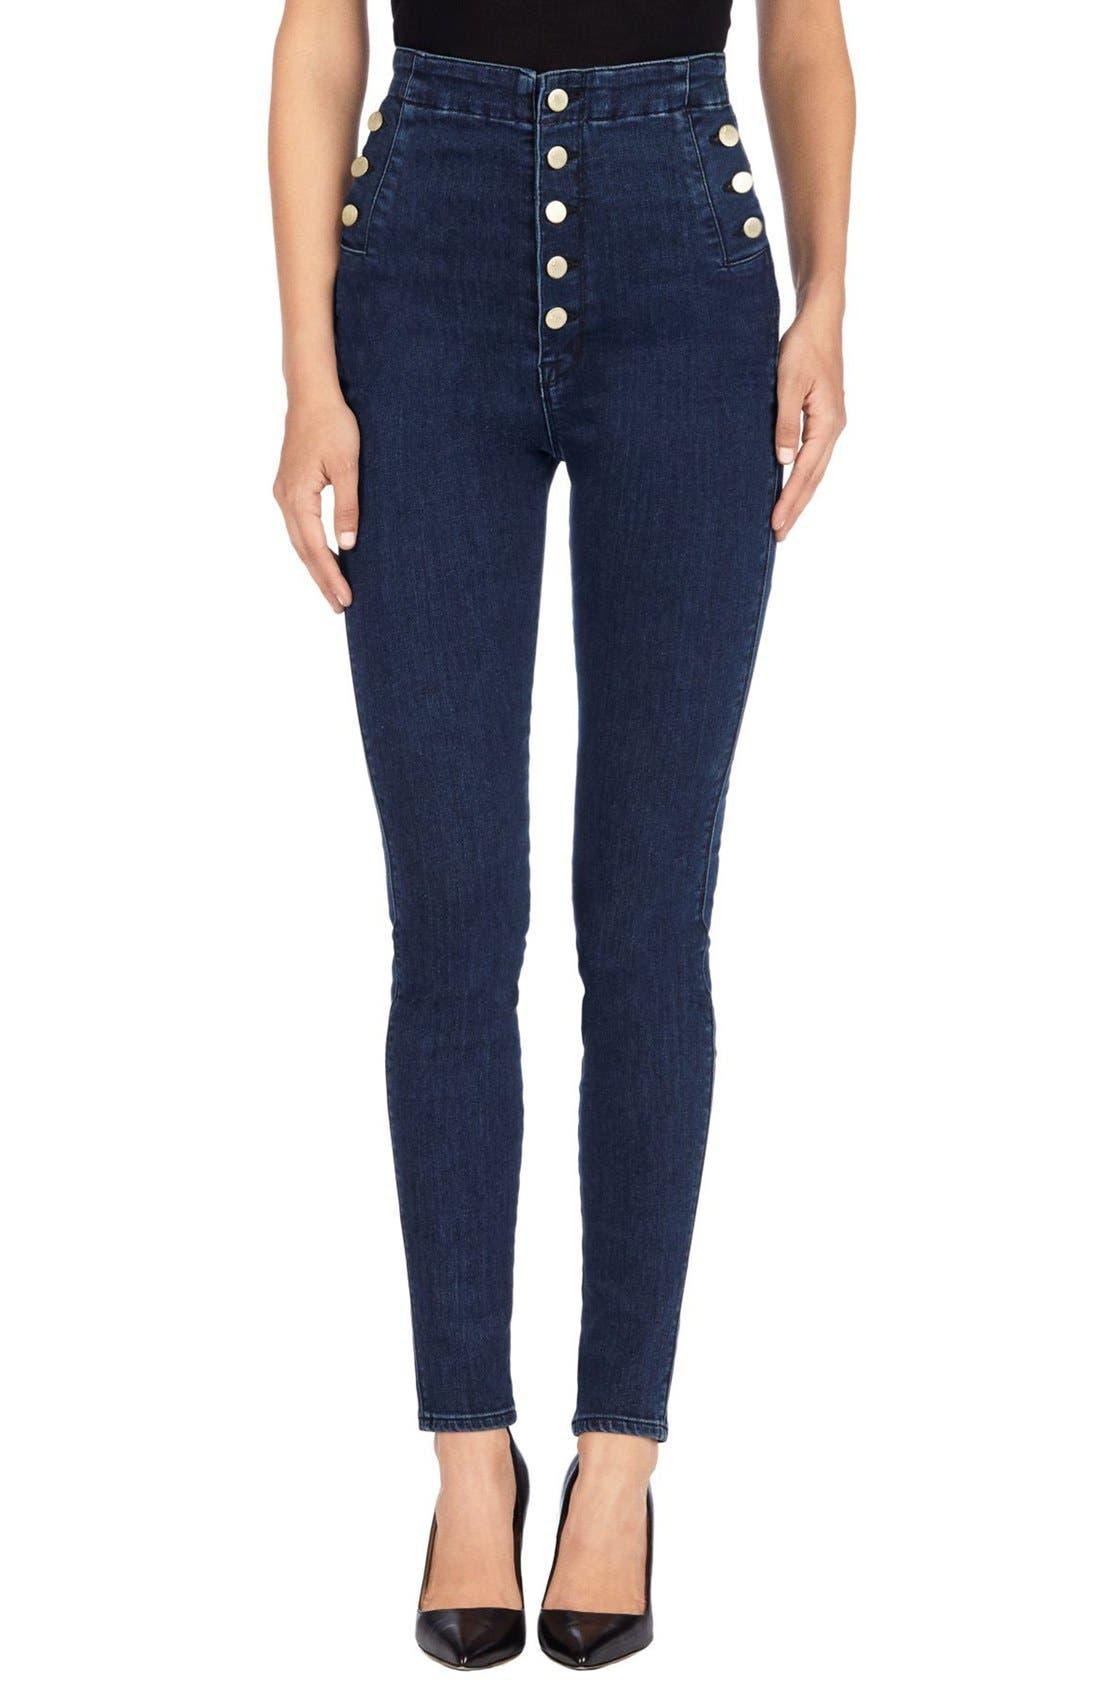 'Natasha Sky High' High Rise Skinny Jeans,                             Alternate thumbnail 2, color,                             410